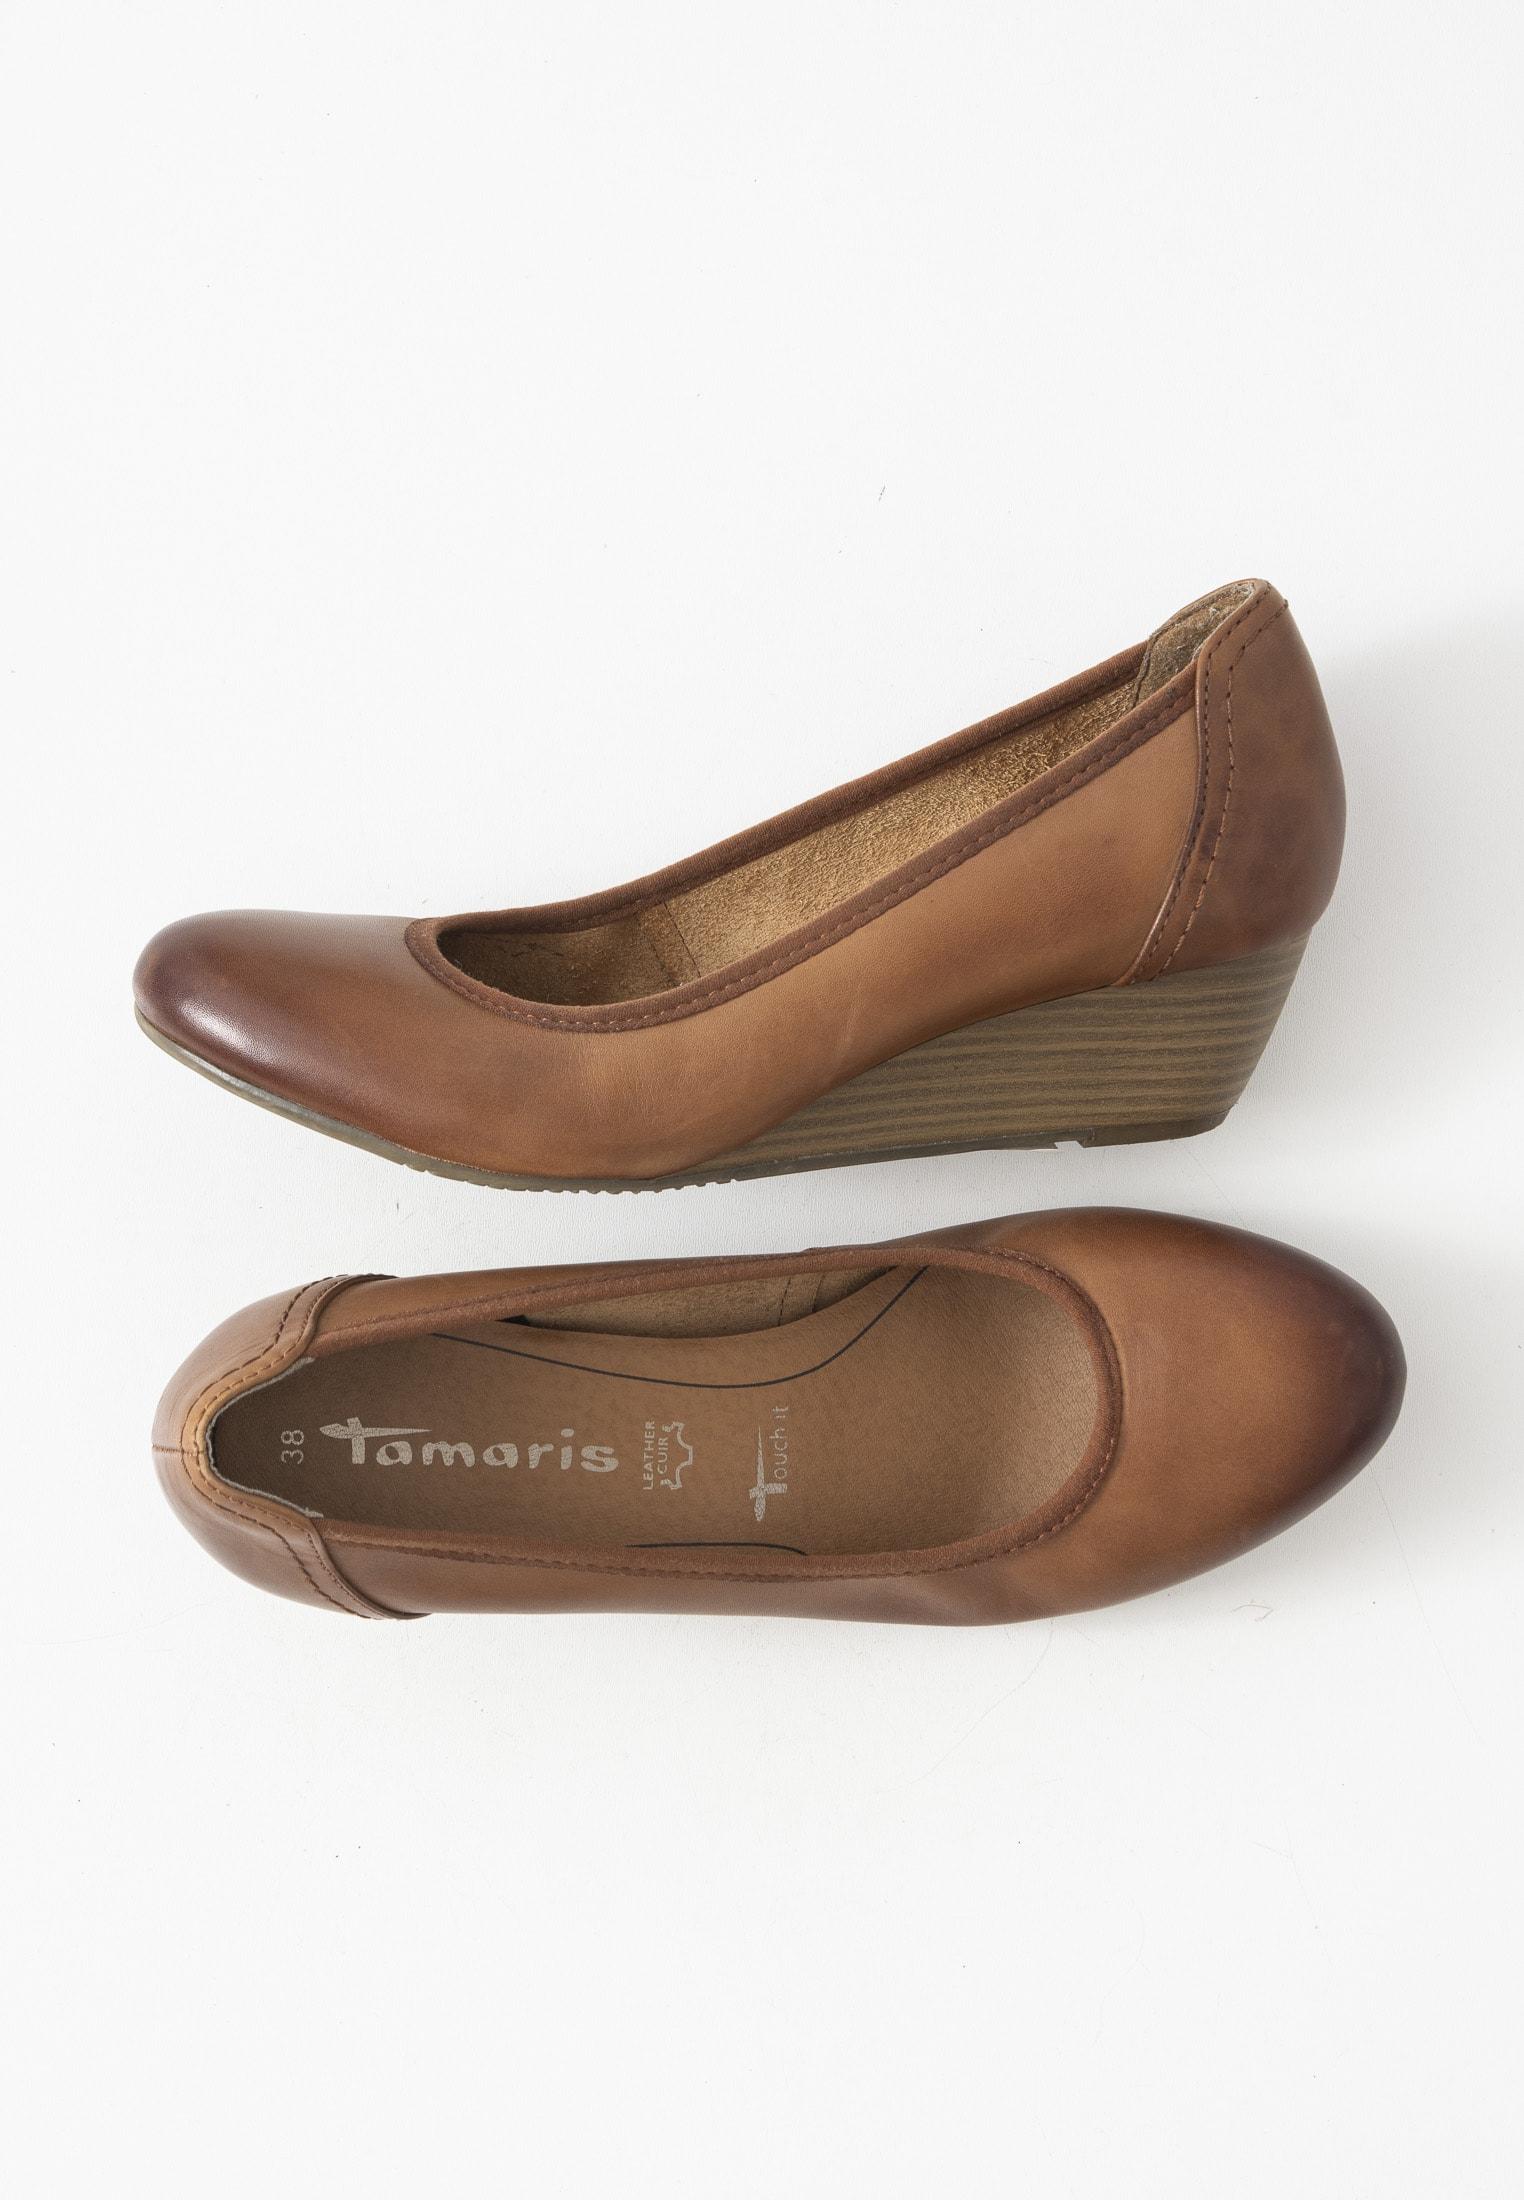 Tamaris Halbschuh / Ballerina Braun Gr.38